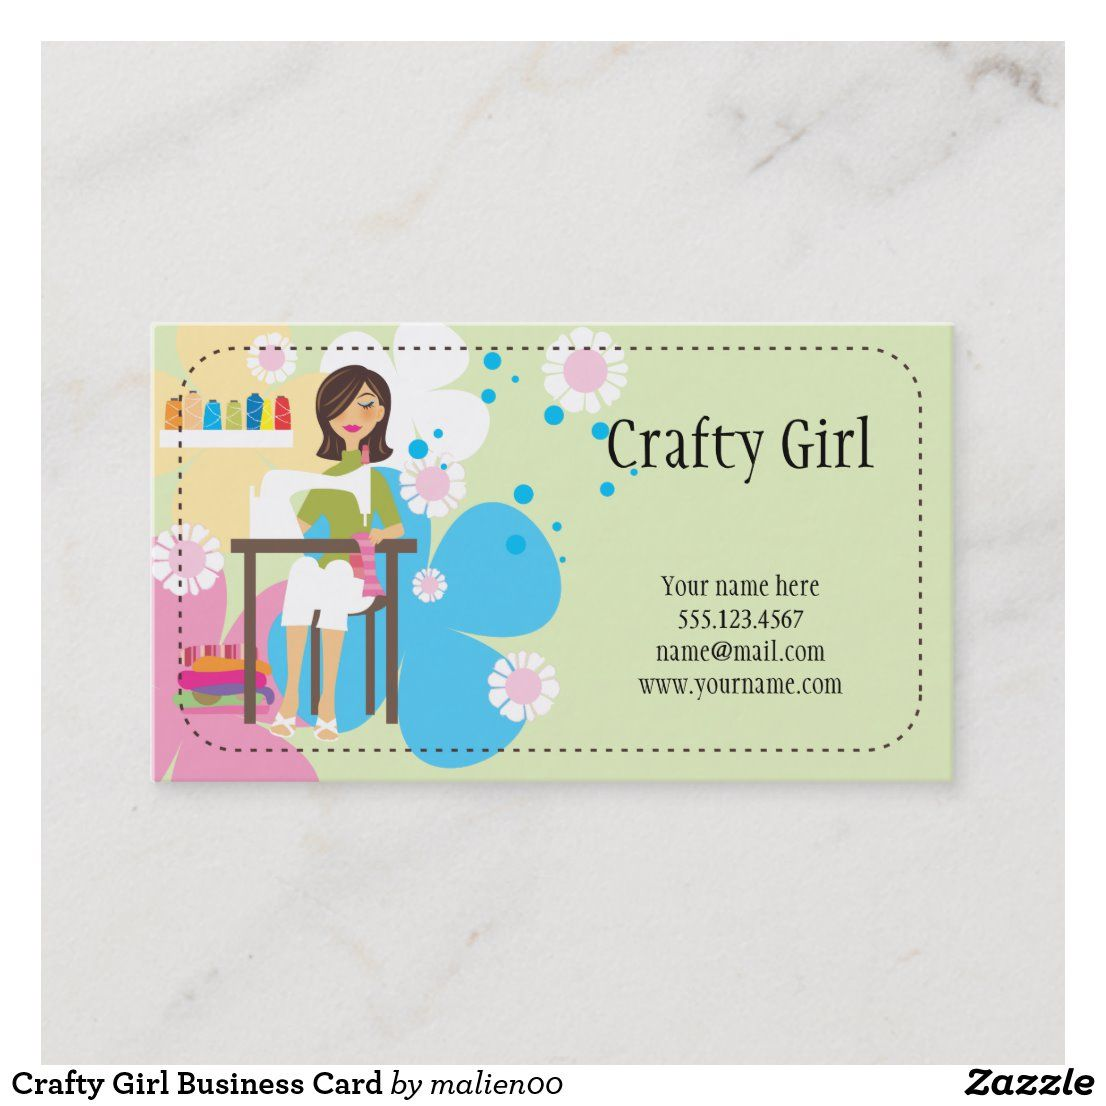 Crafty Girl Business Card Zazzle Com Craft Business Cards Cards Crafty